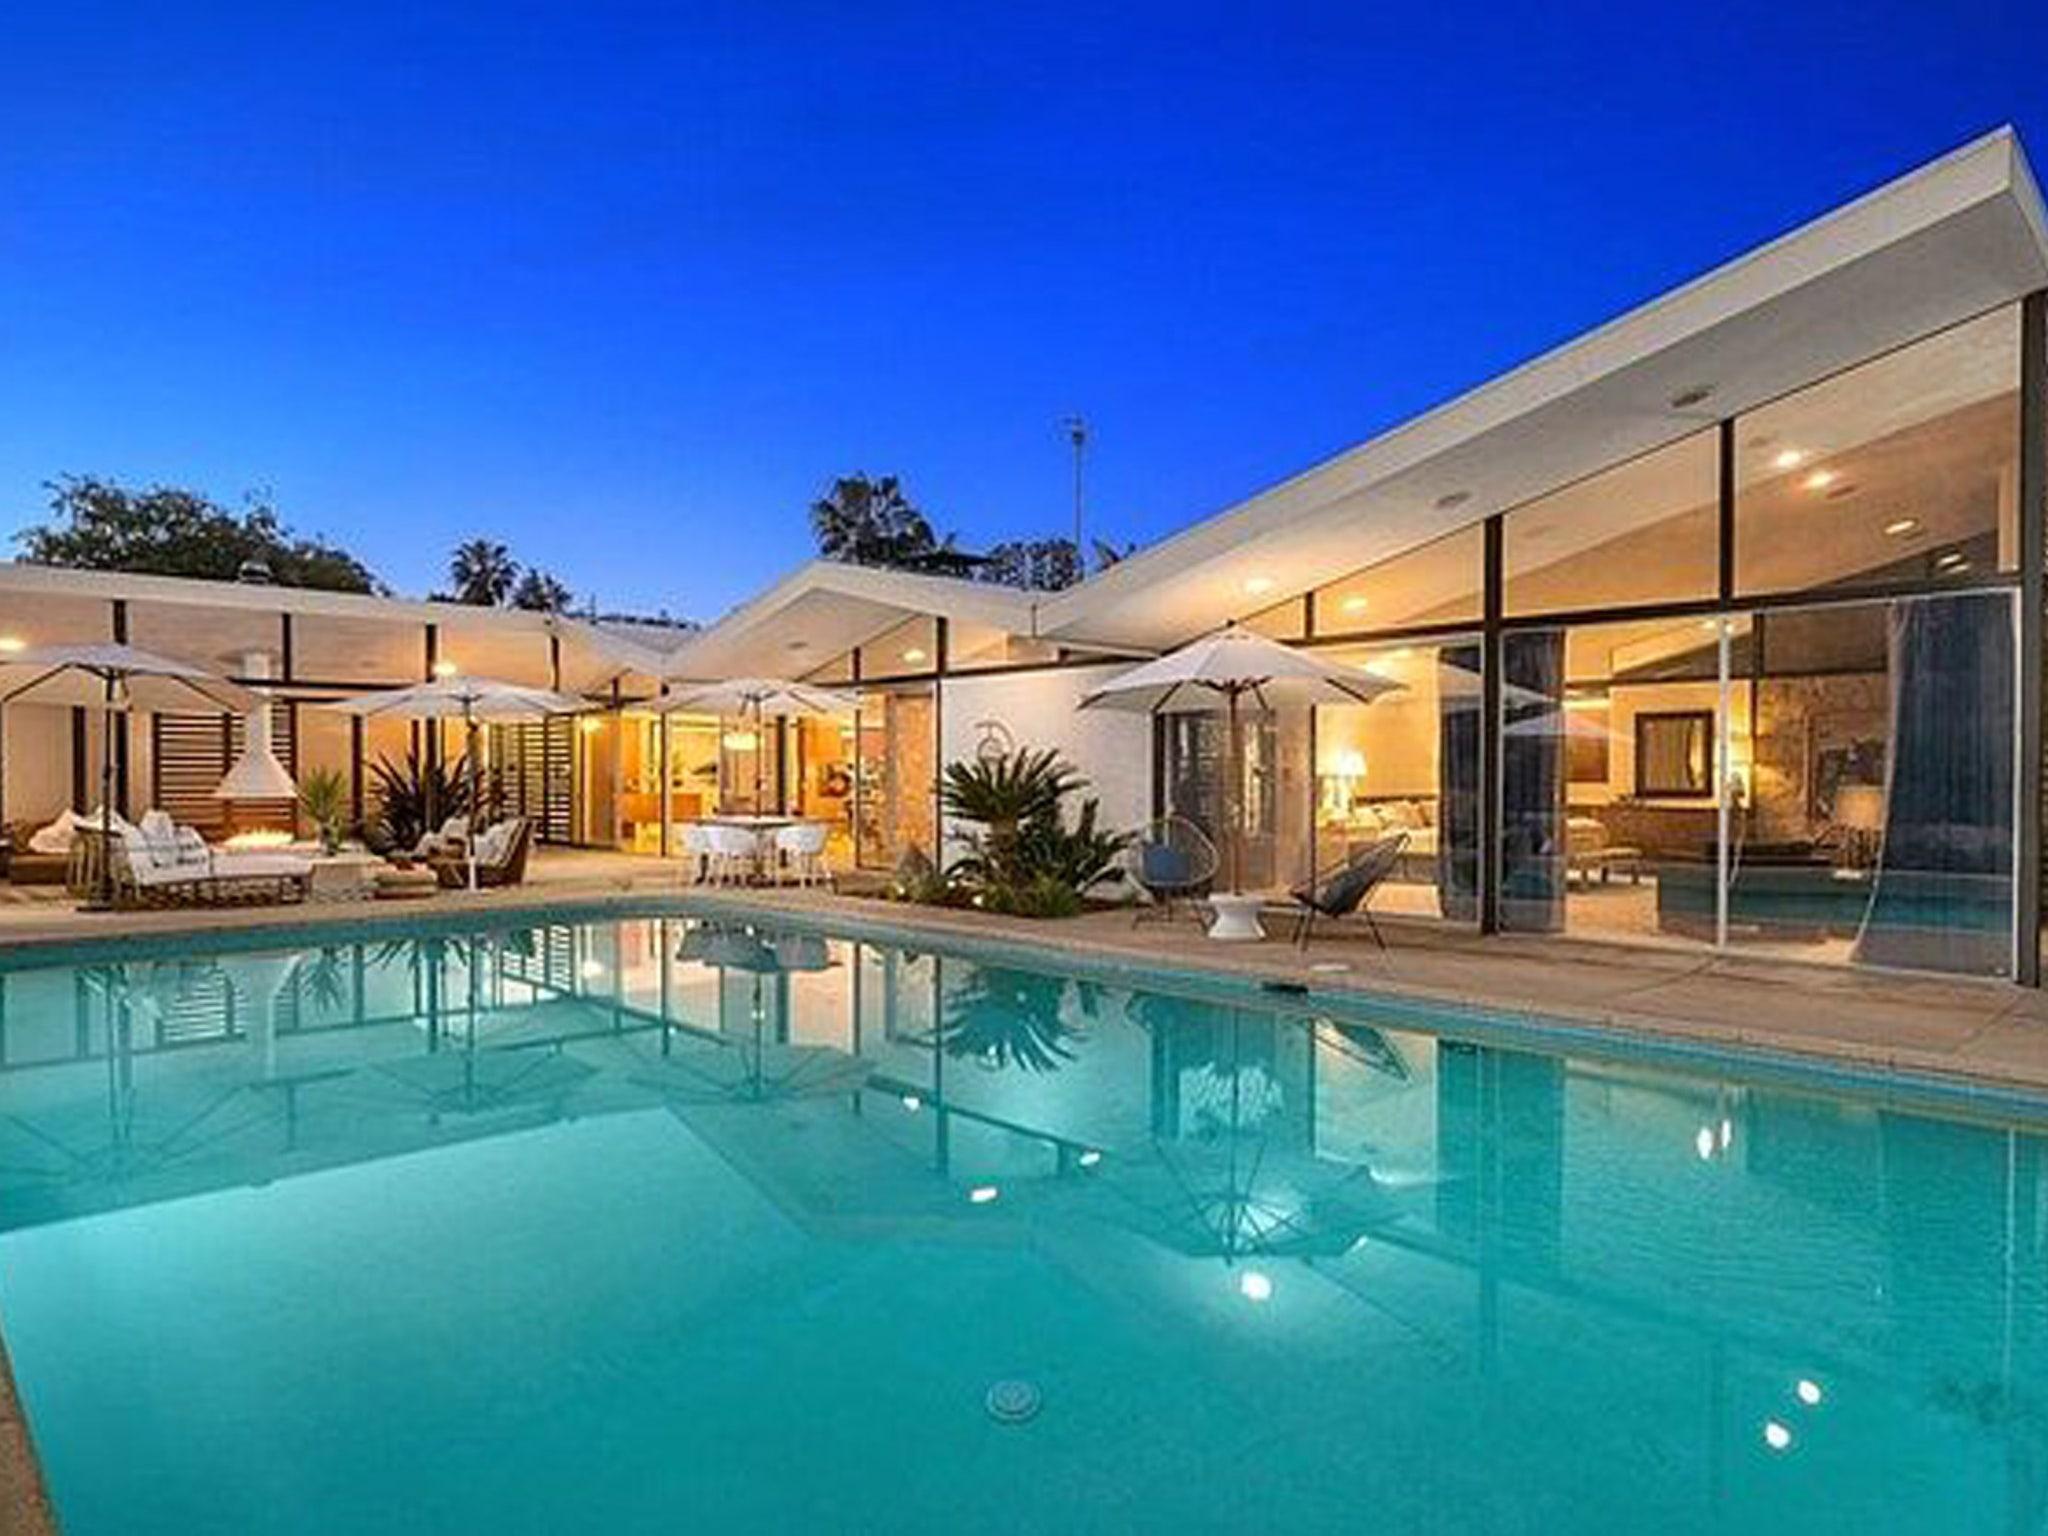 tmz.com - TMZ Staff - Julie Bowen Sells Hollywood Hills Home Above Asking for $4.2 Million